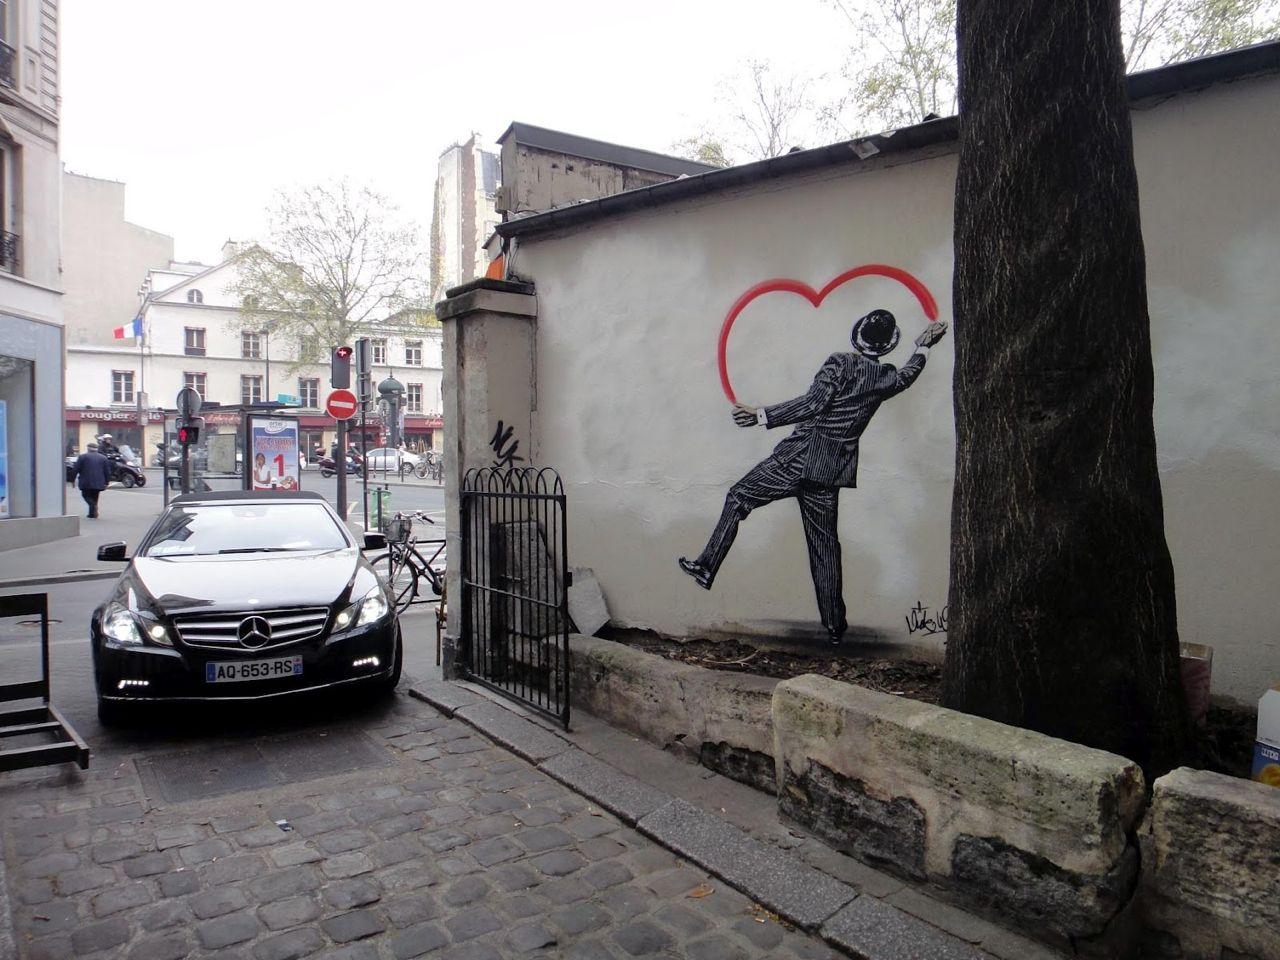 Nick_Walker_Paris_StreetArtNews-13